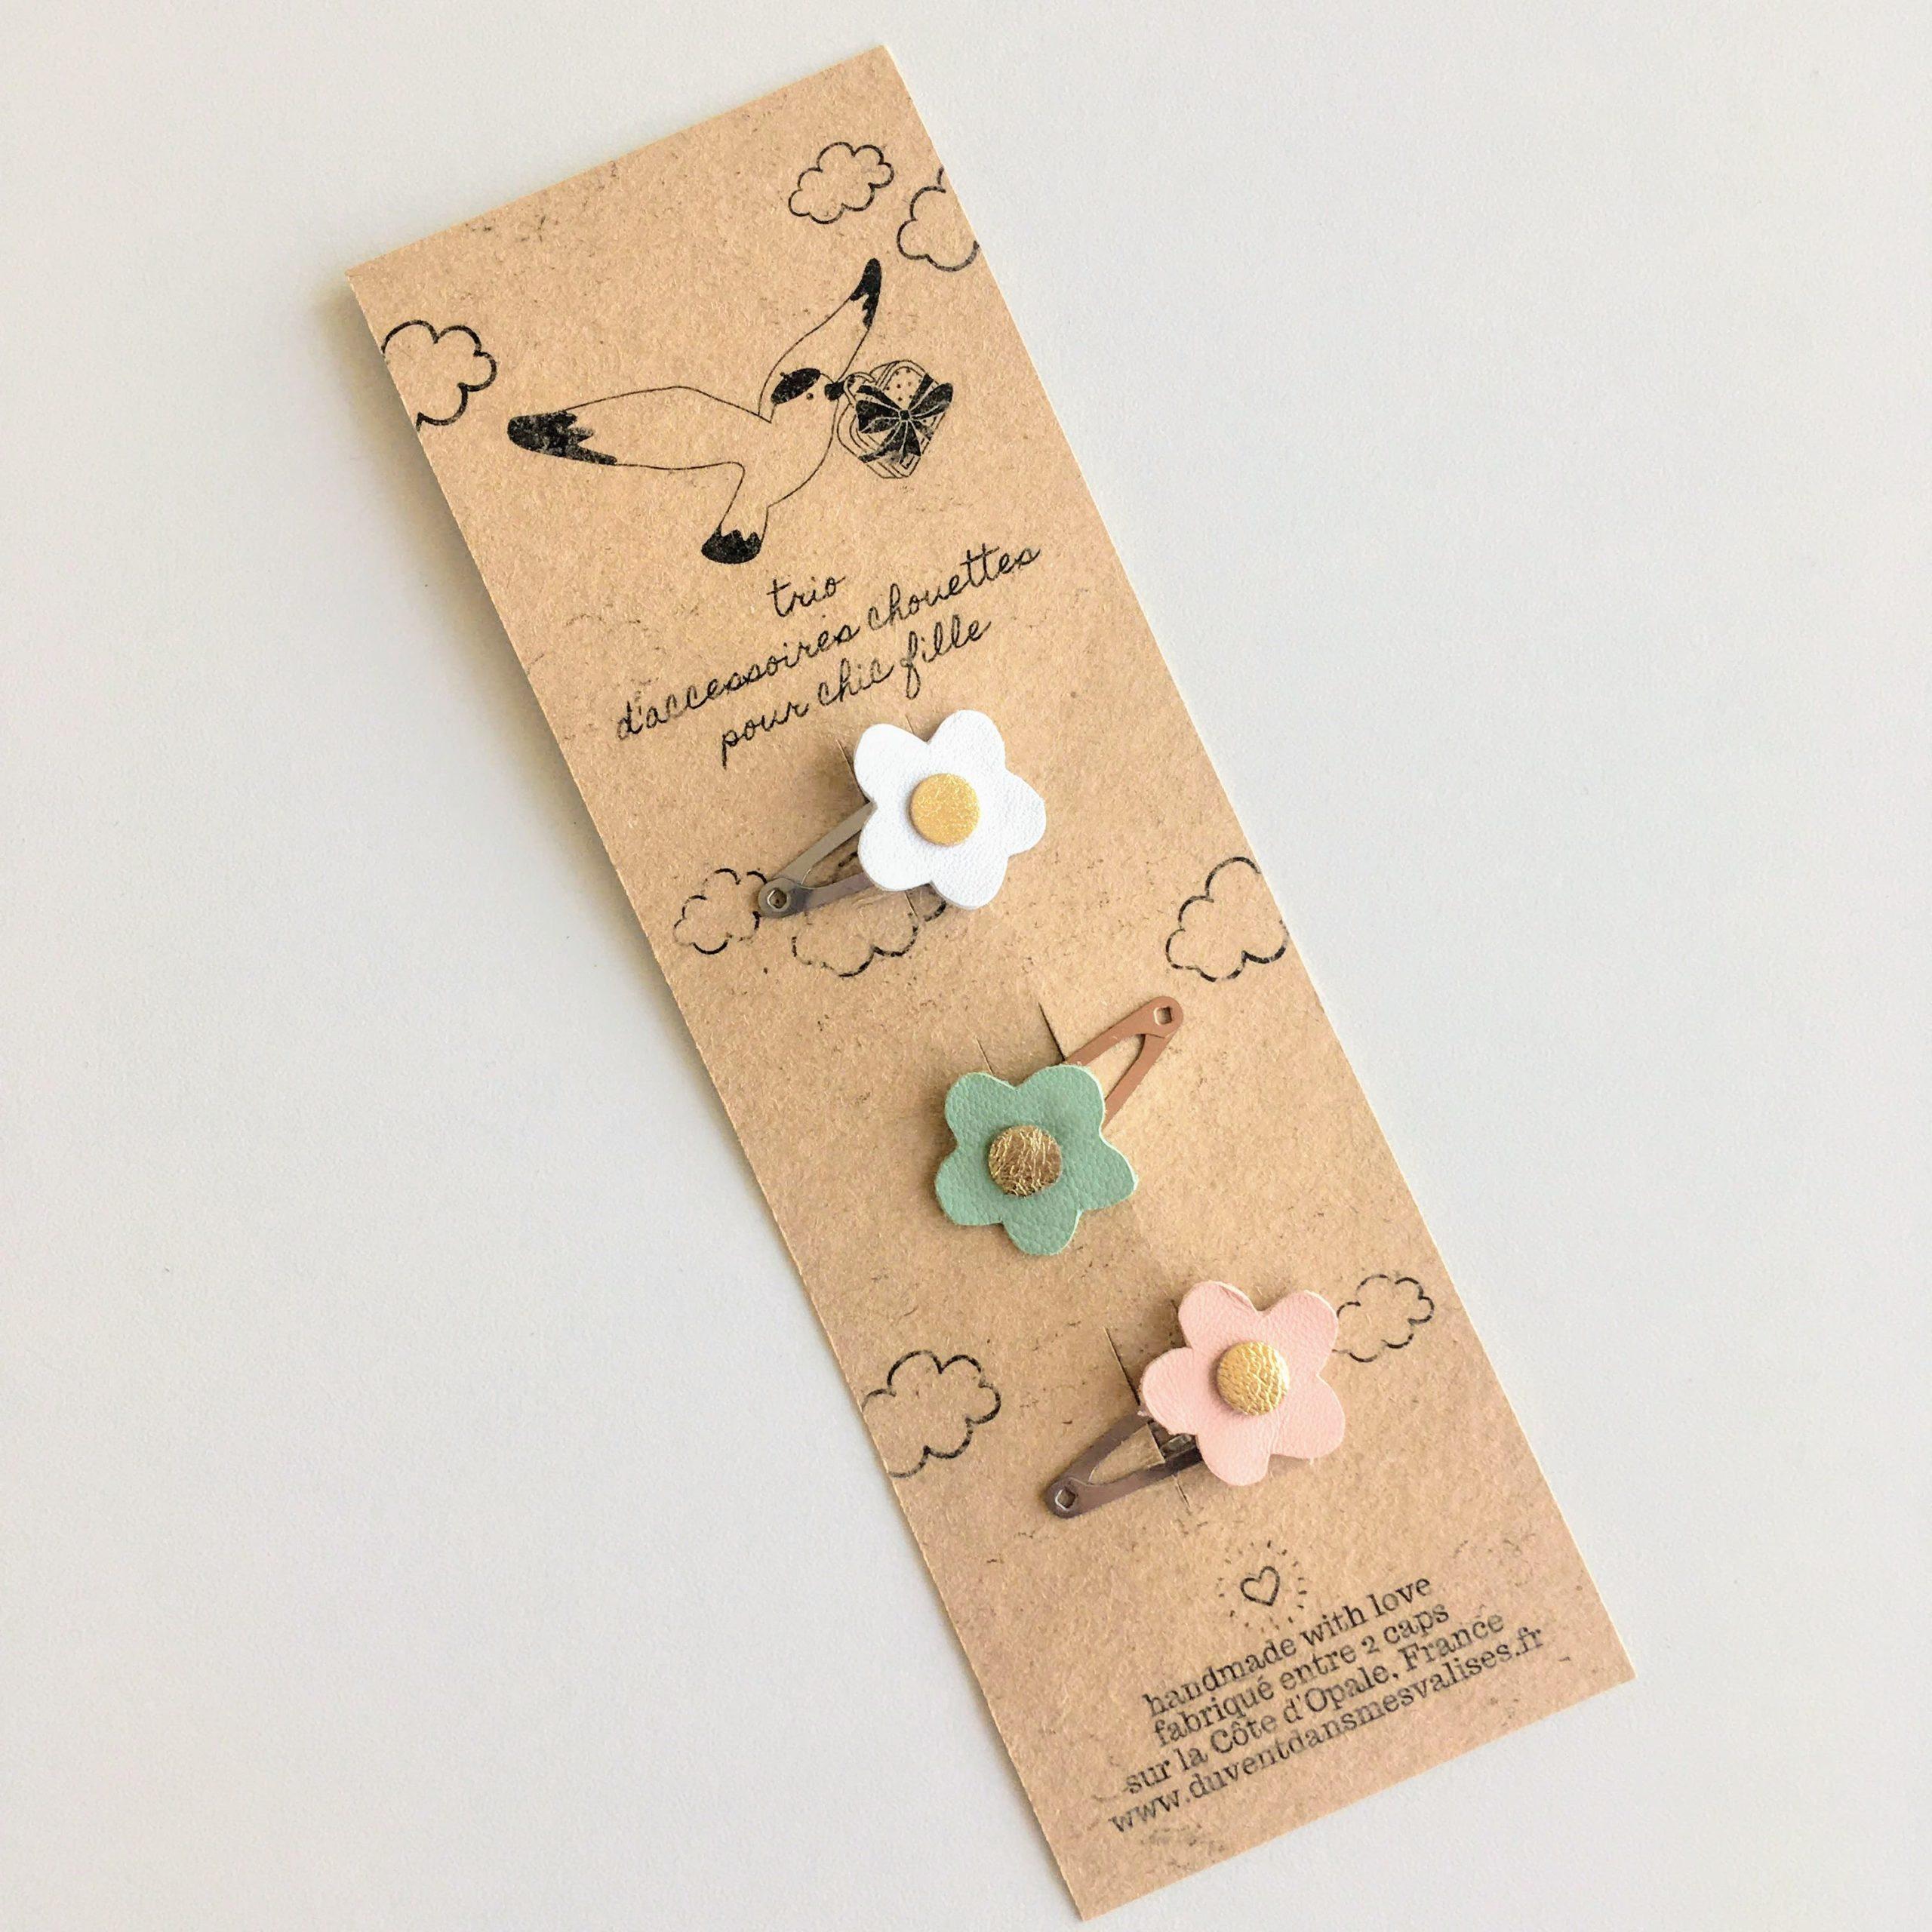 trio de barrettes clic clac fleurs made in france en cuir upcycled - du vent dans mes valises6